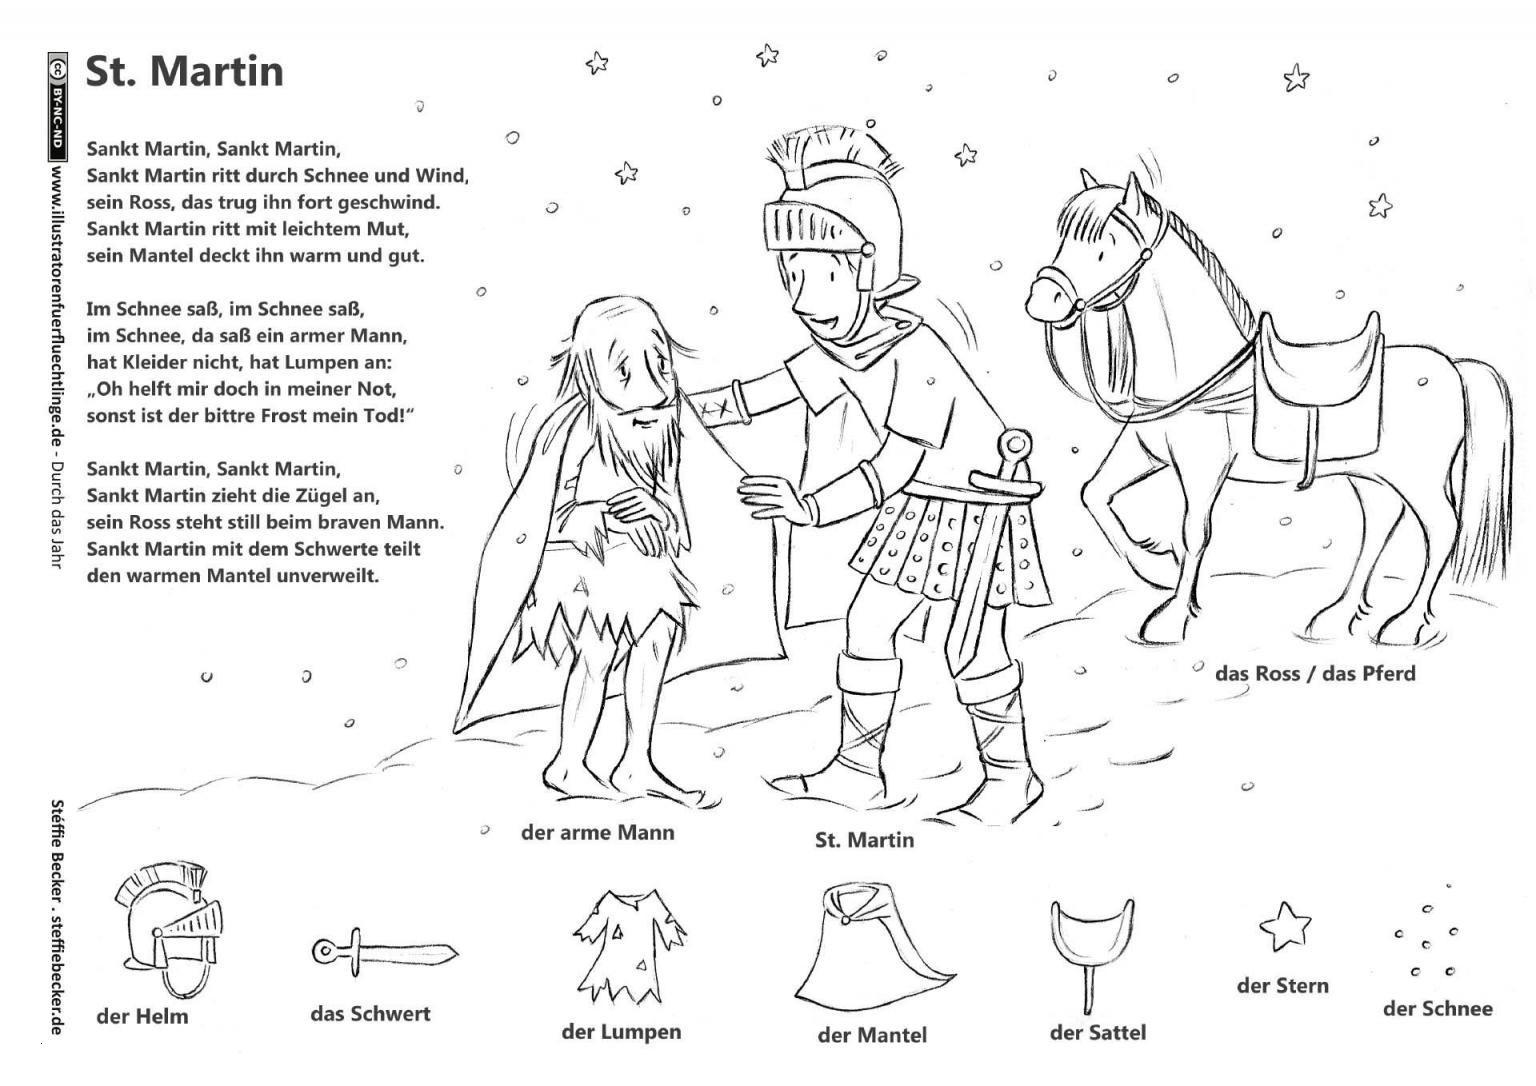 Robin Hood Ausmalbild Genial Bayern Ausmalbilder Schön Igel Grundschule 0d Archives Inspirierend Fotografieren